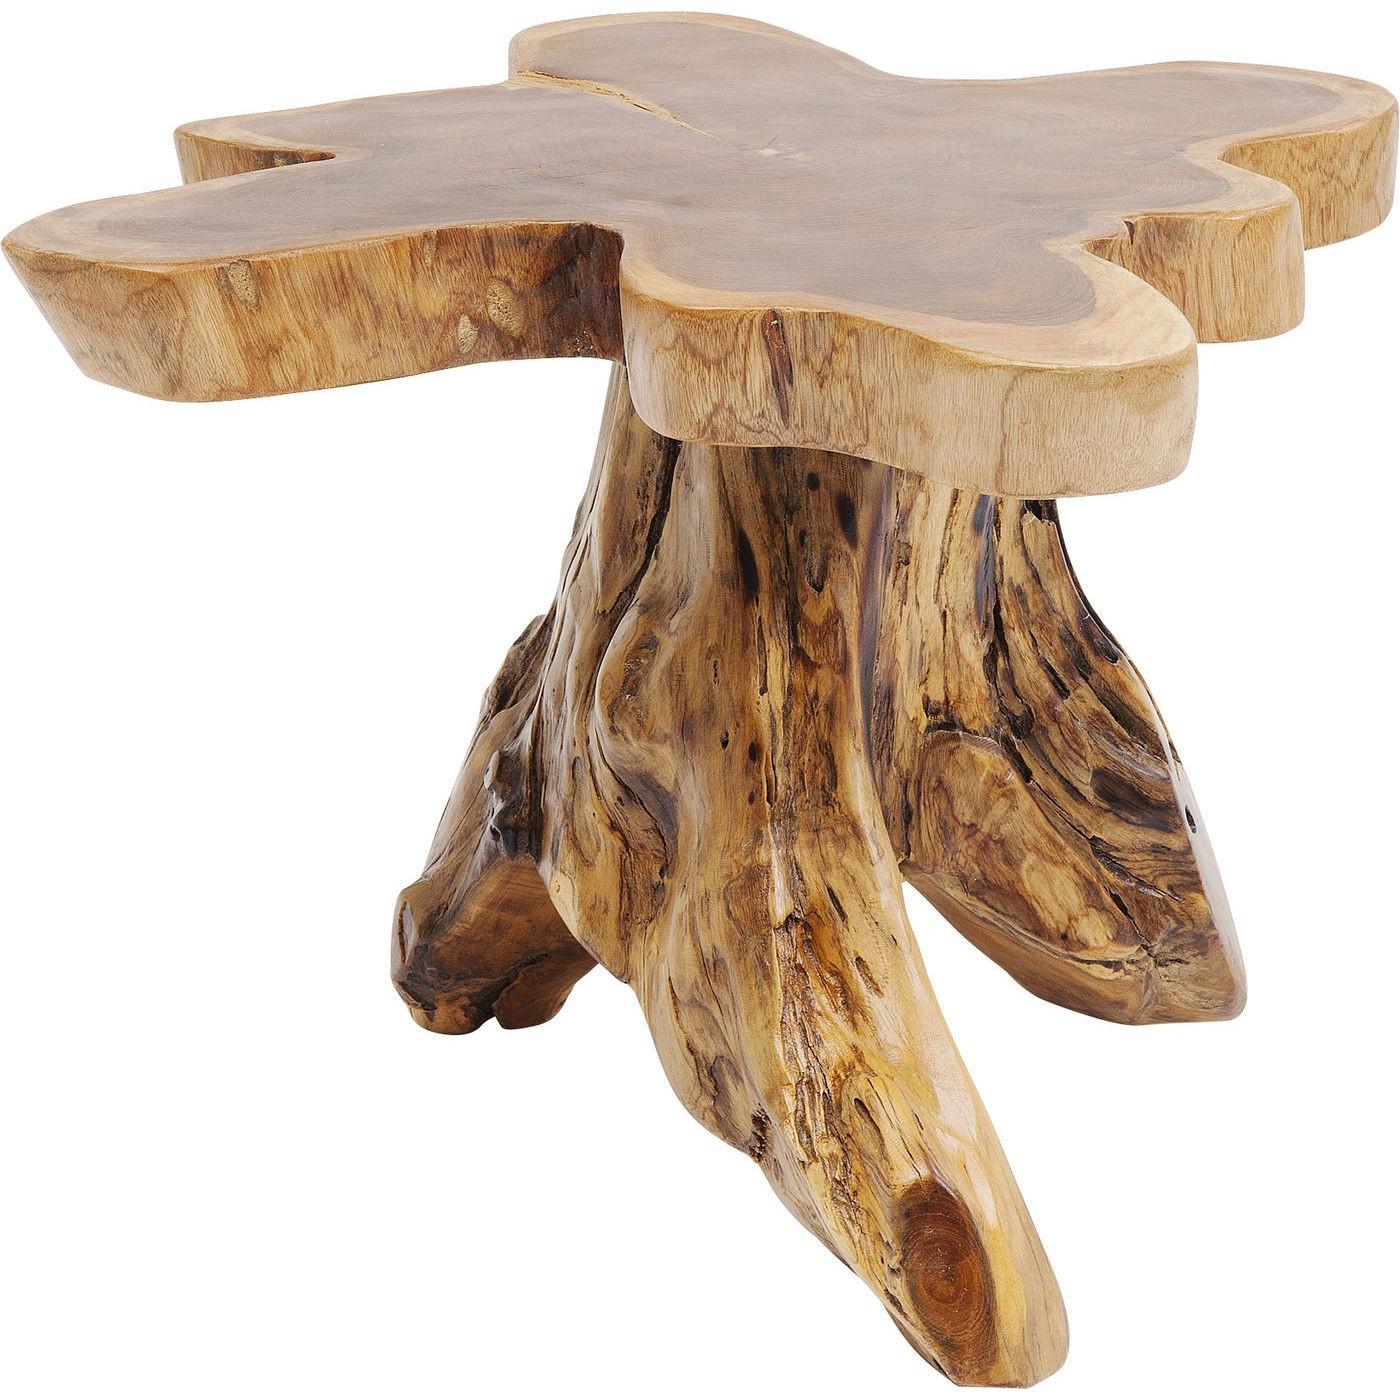 Table basse souche d'arbre en teck massif